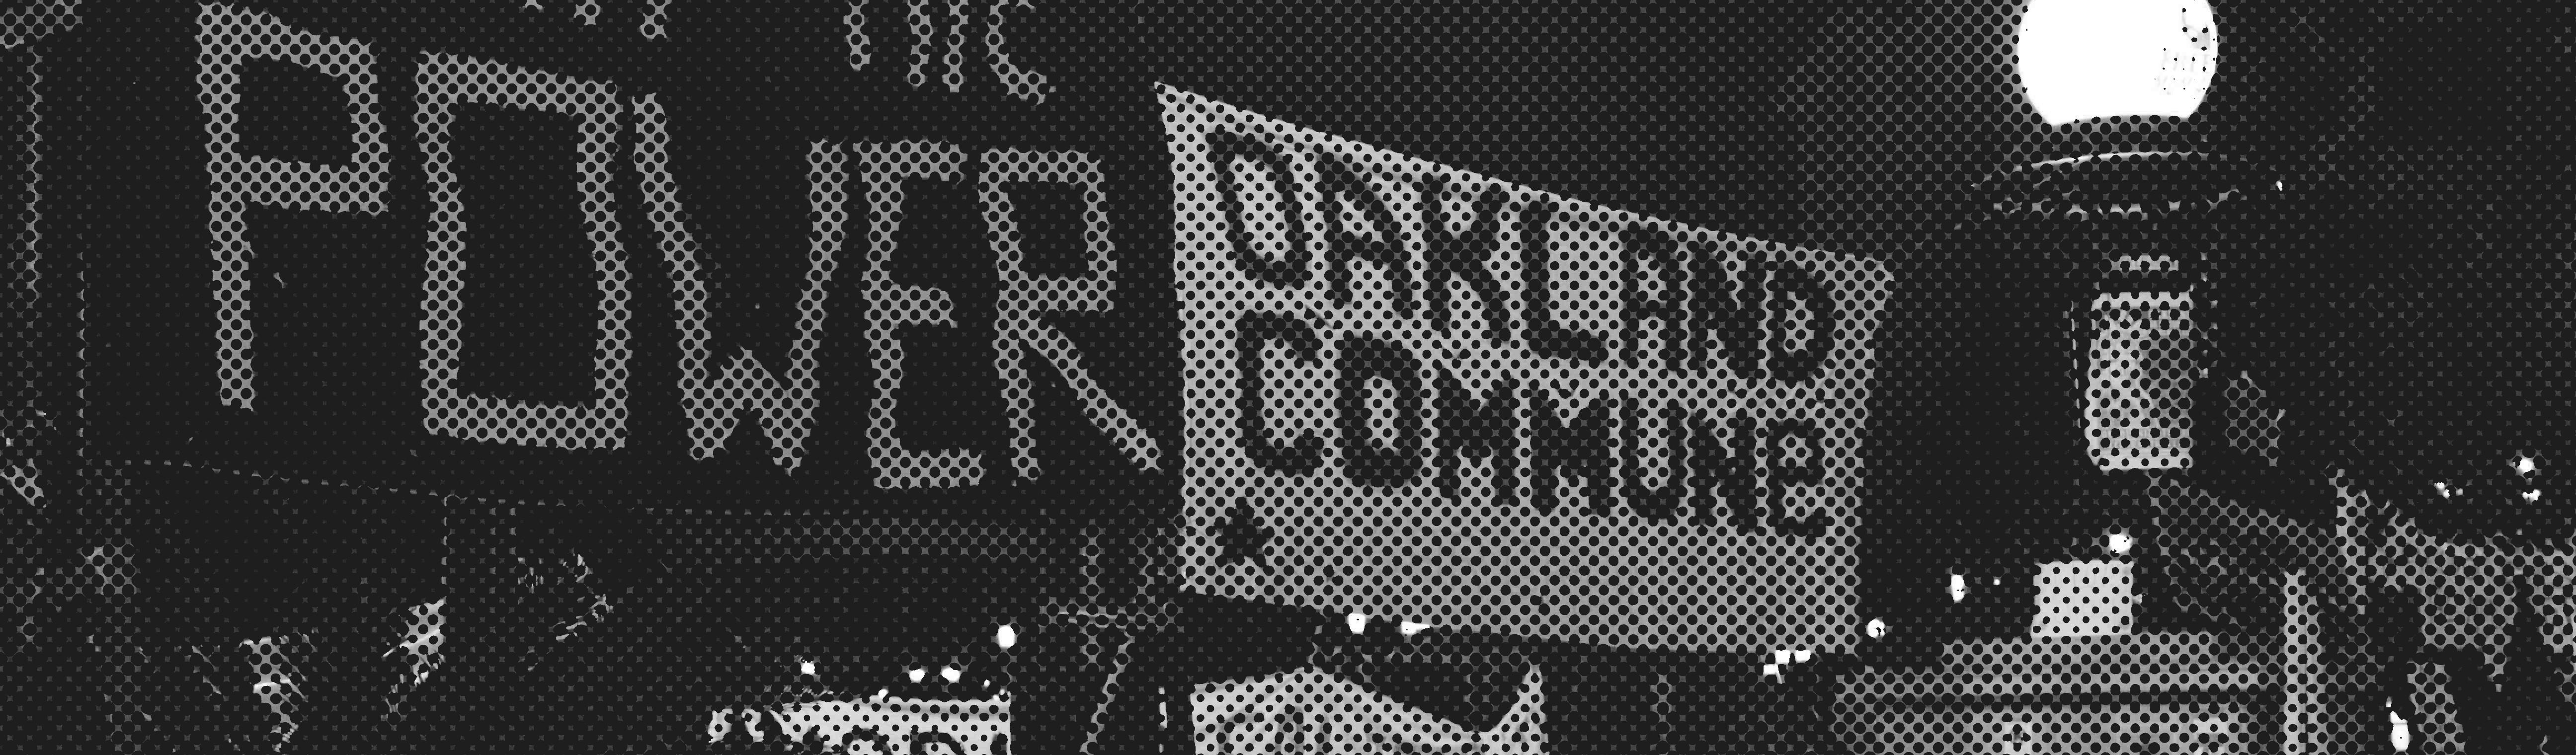 Oakland Commune banner